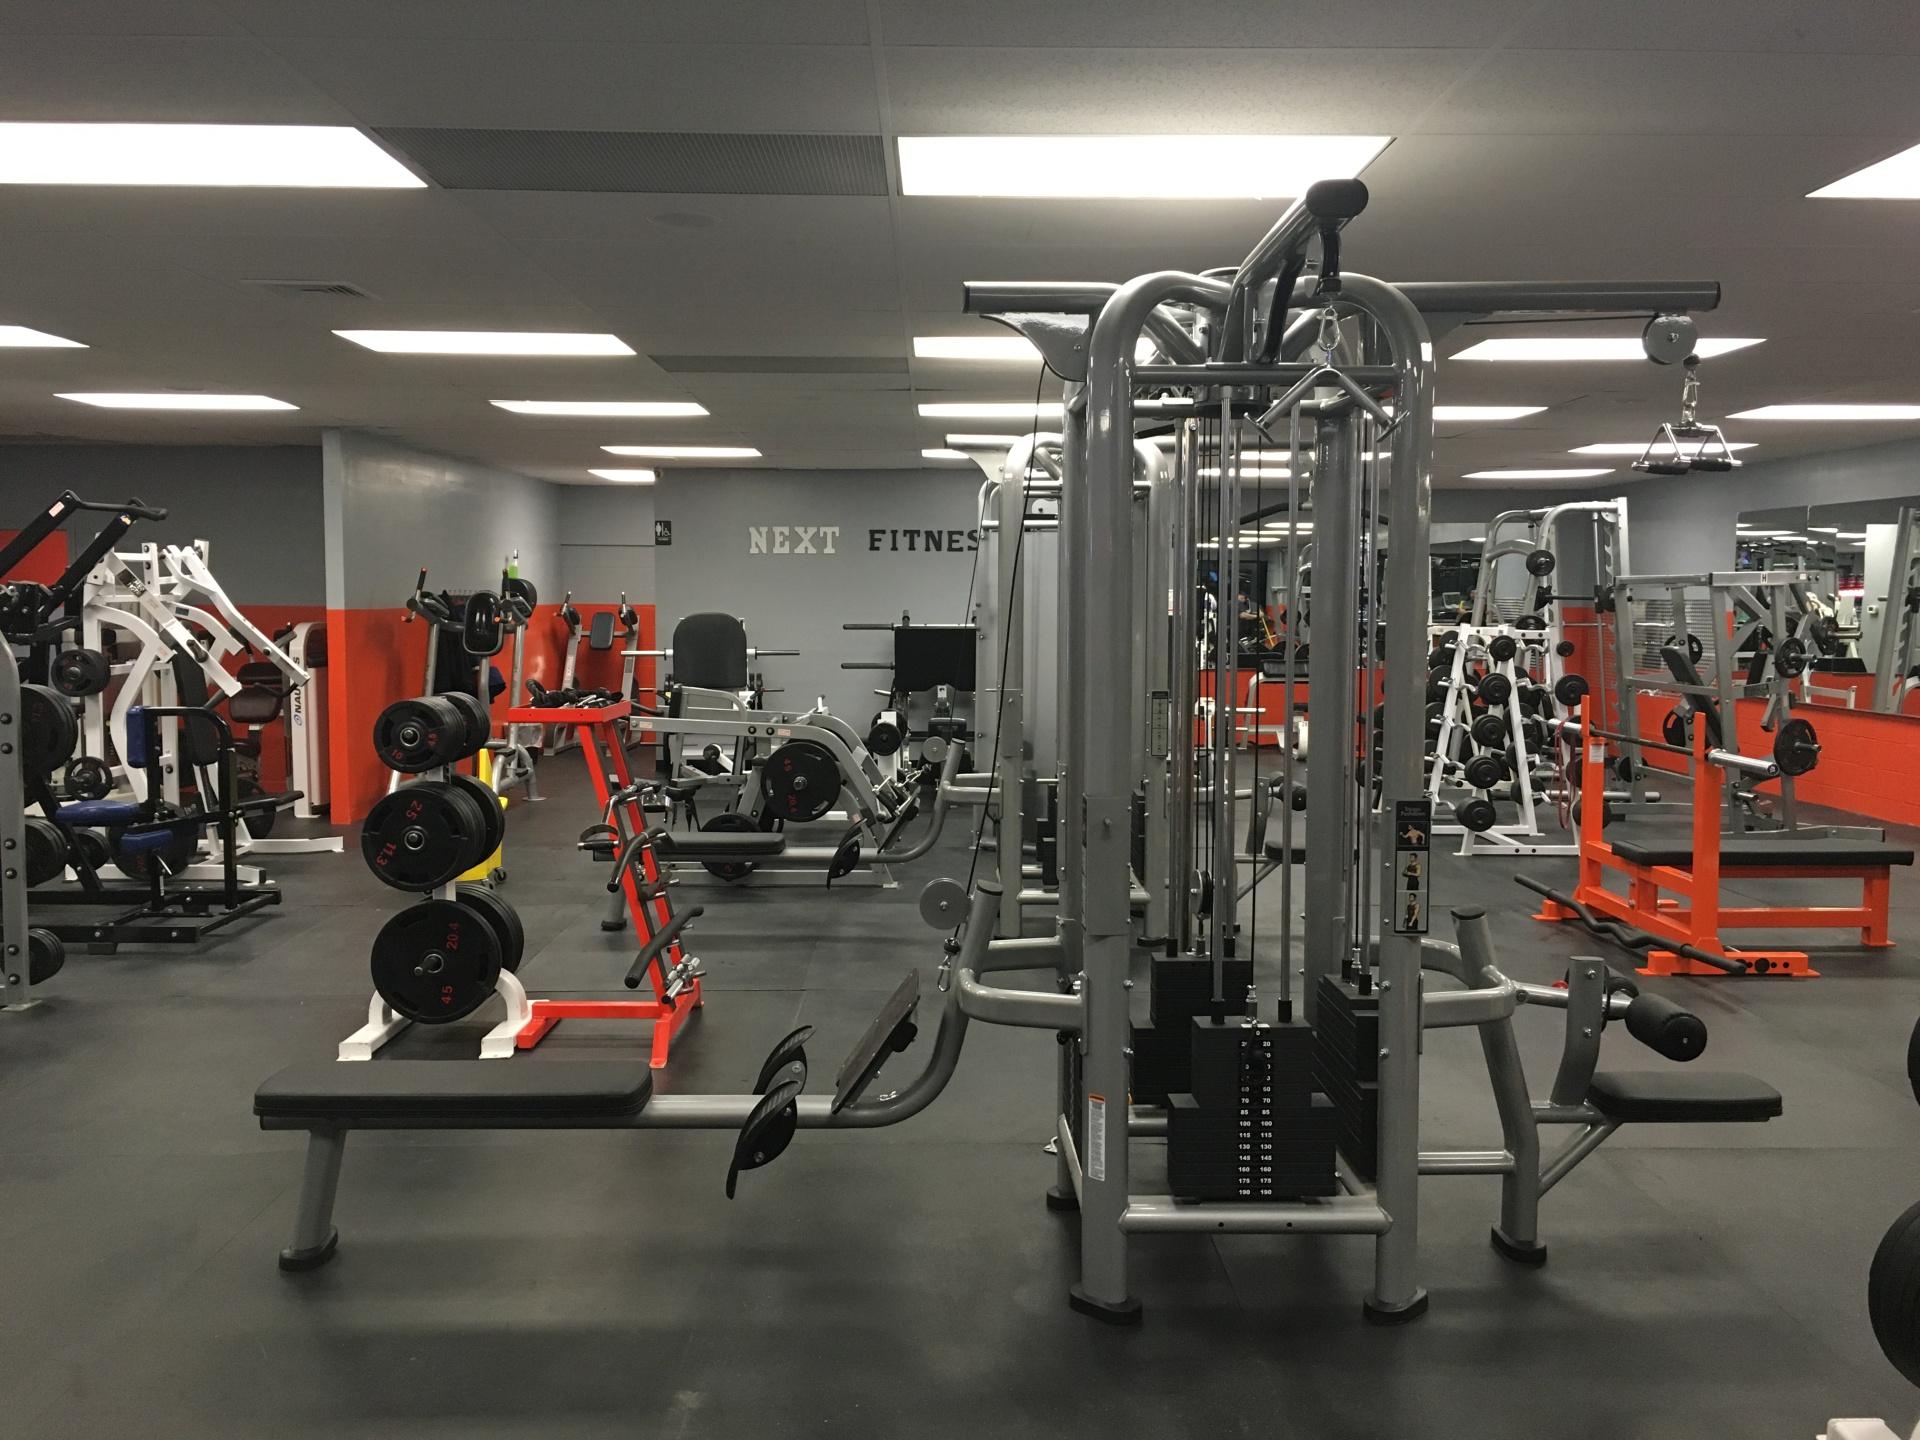 Gym Memberships, Memberships, Fitness, Lifting, Weights, Fitness, Gym, Agawam MA, Feeding Hills